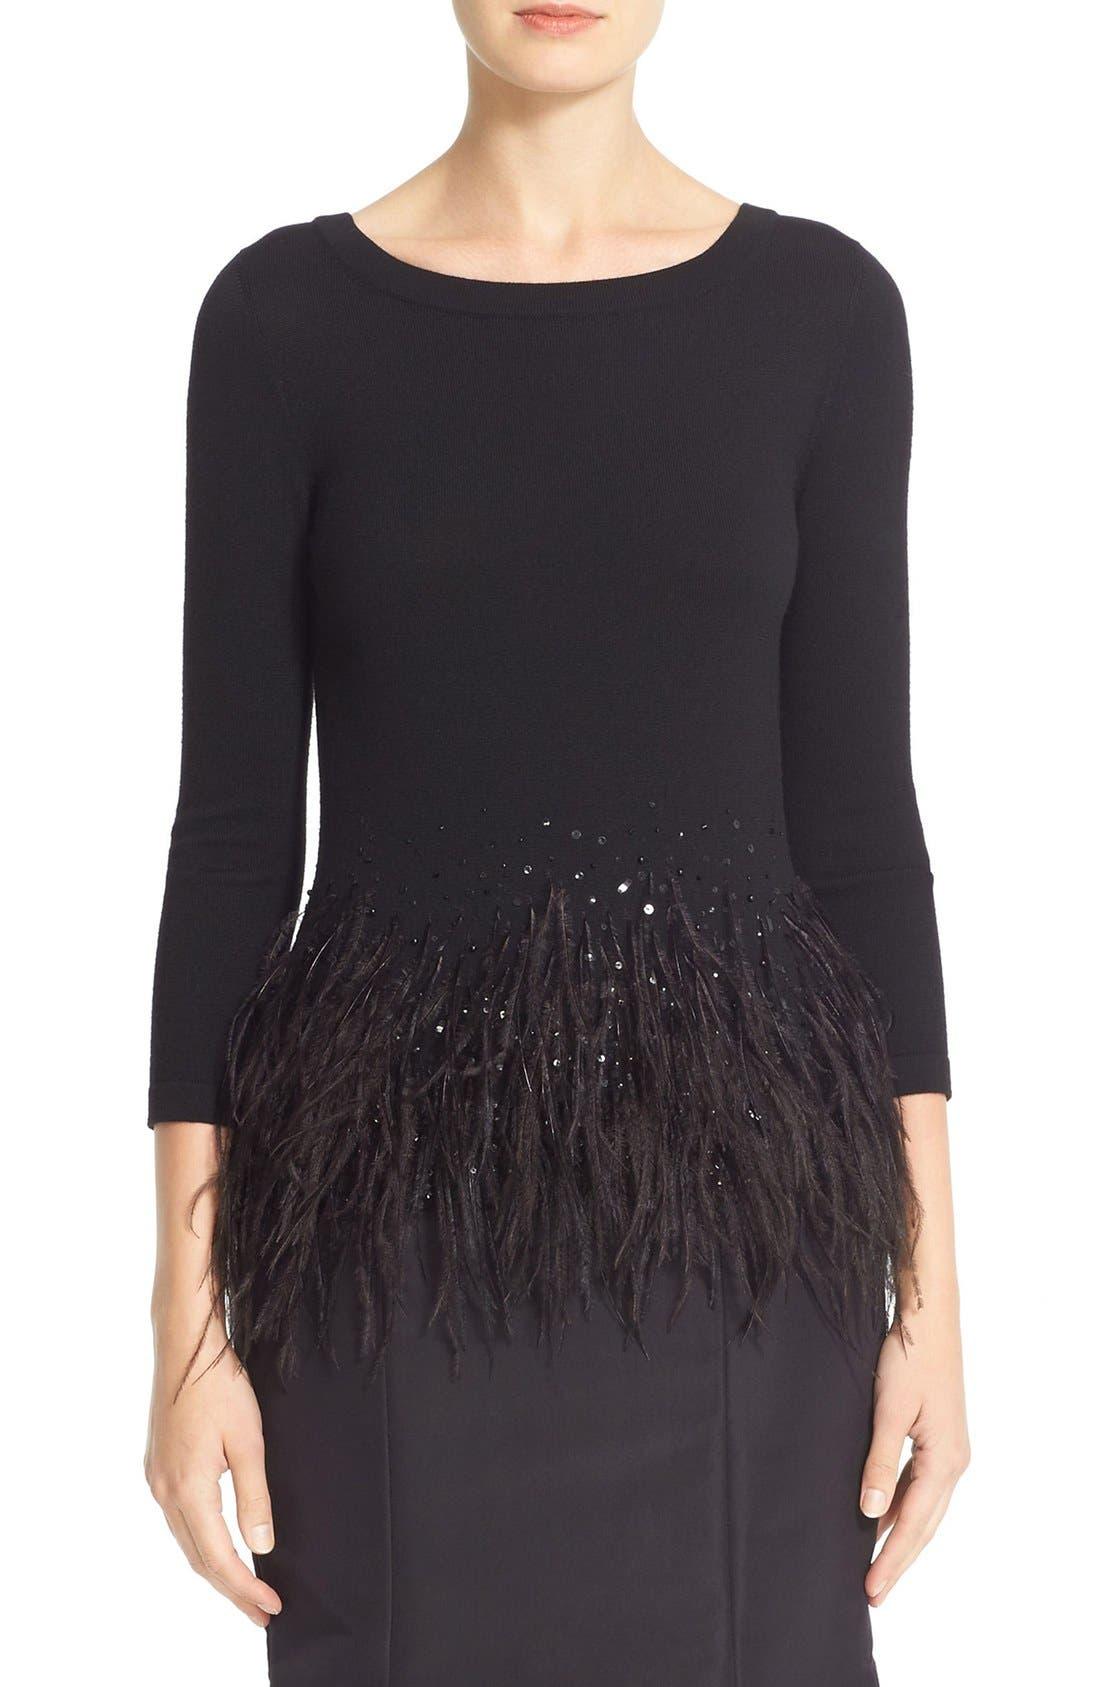 Main Image - Carolina Herrera Sequin & Feather Trim Wool Sweater